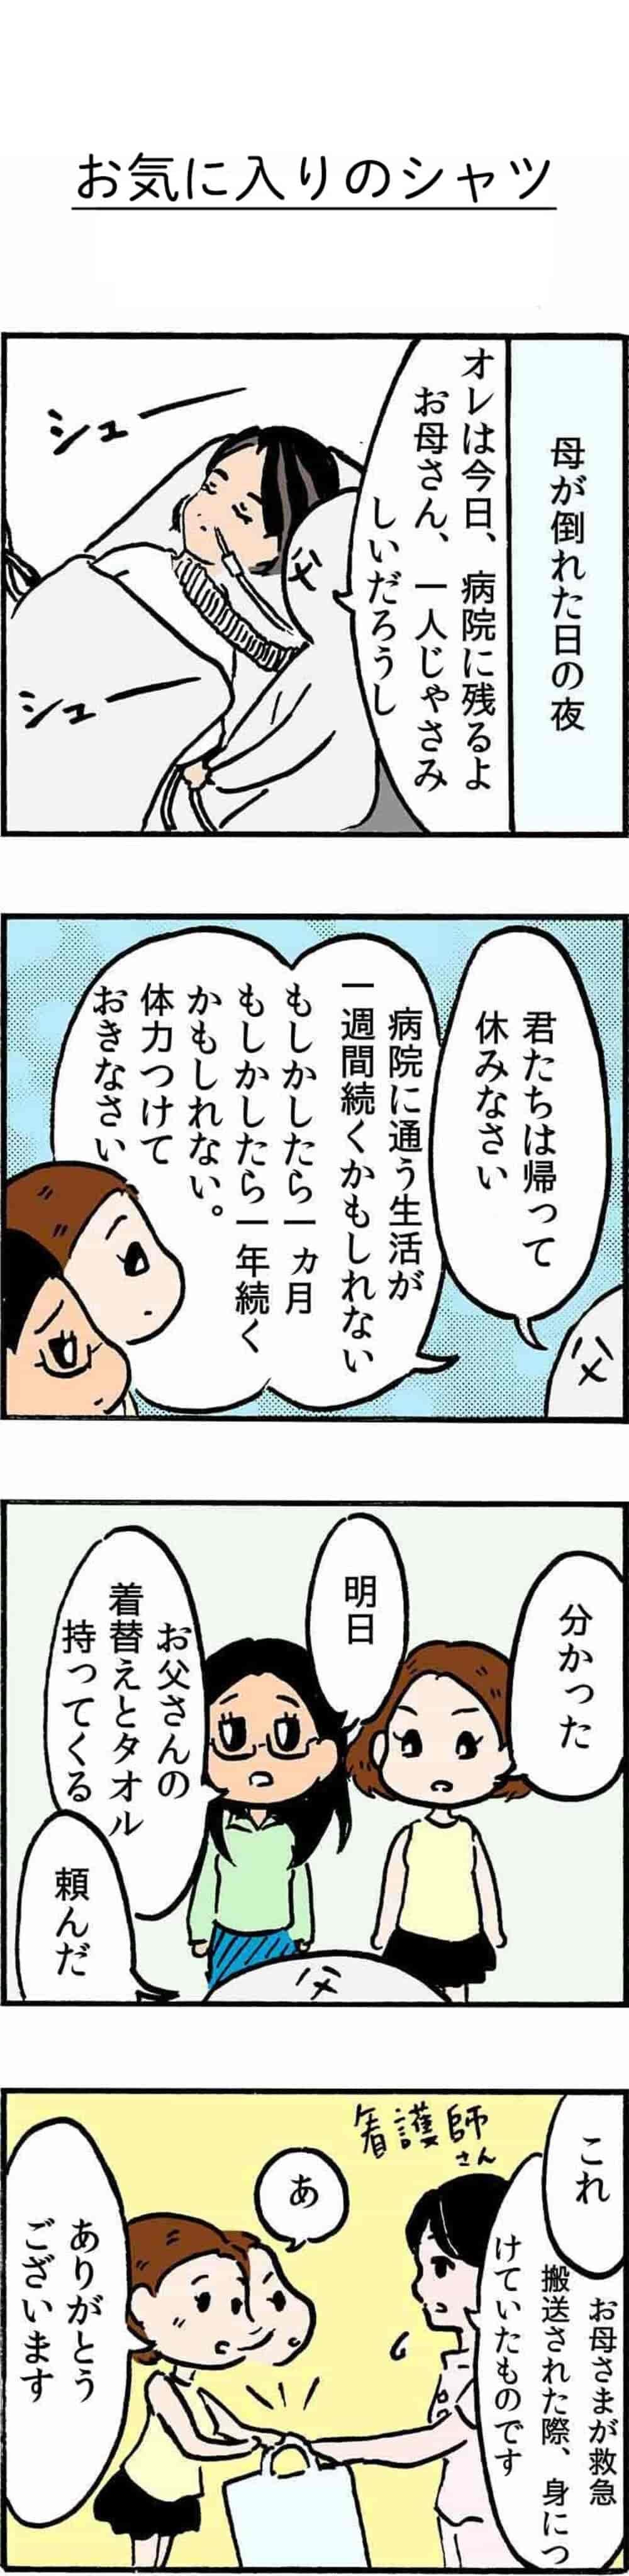 7dai3wa-min